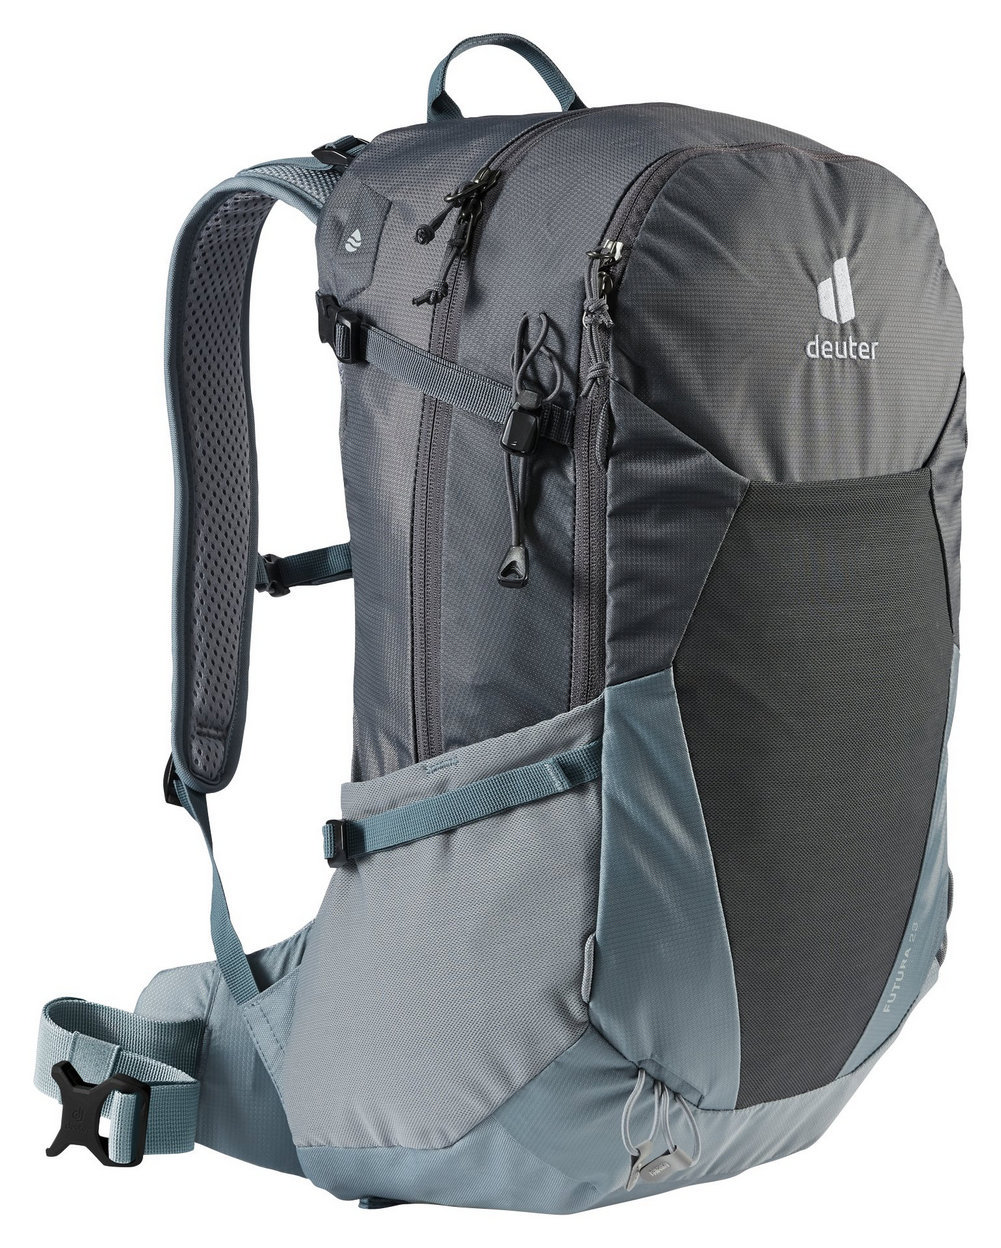 Туристические рюкзаки легкие Рюкзак Deuter Futura 23 (2021) 3400121-4409-Futura_23-d00.jpg